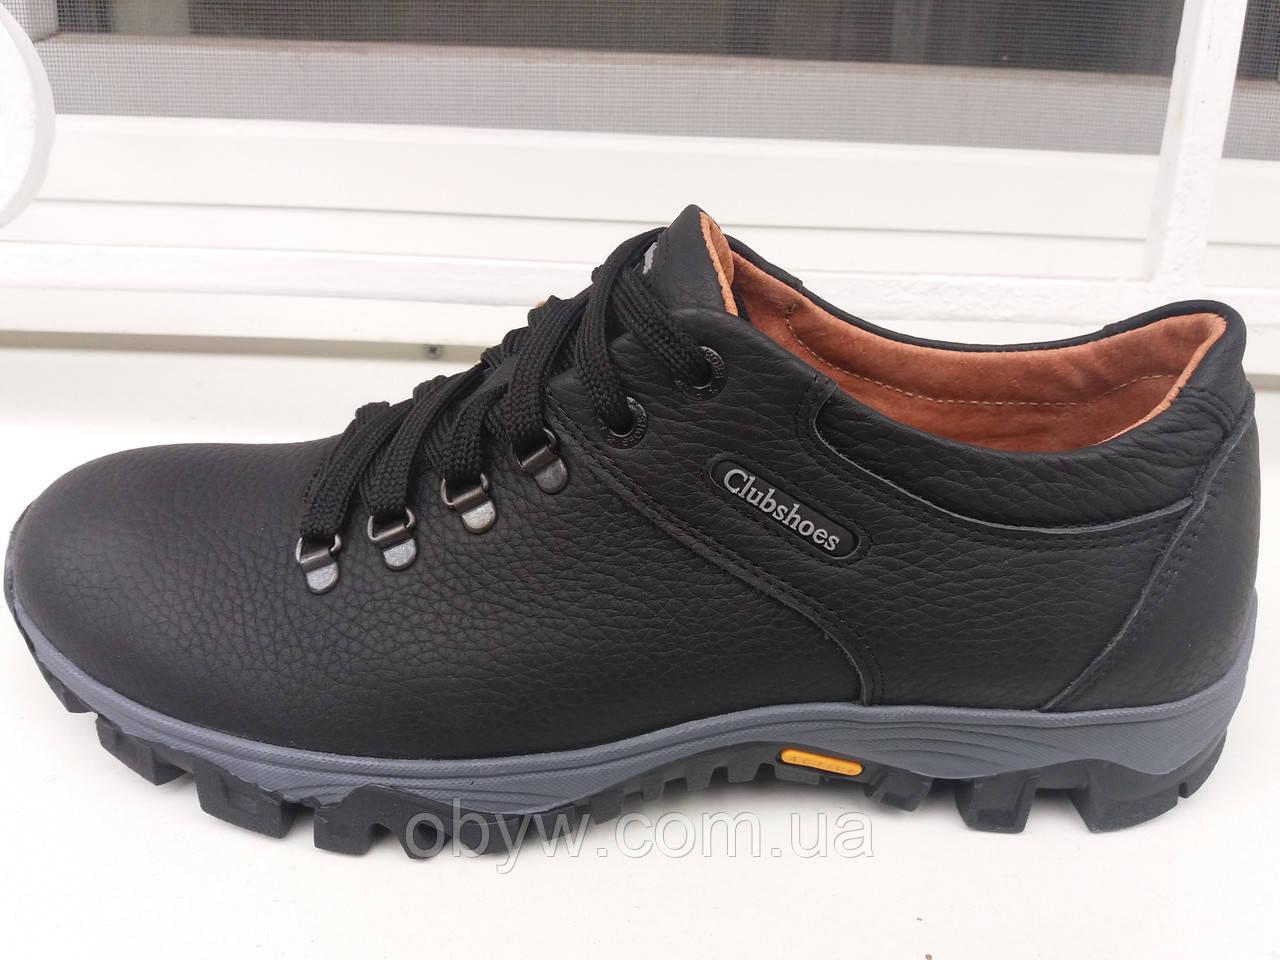 Весенняя мужская обувь